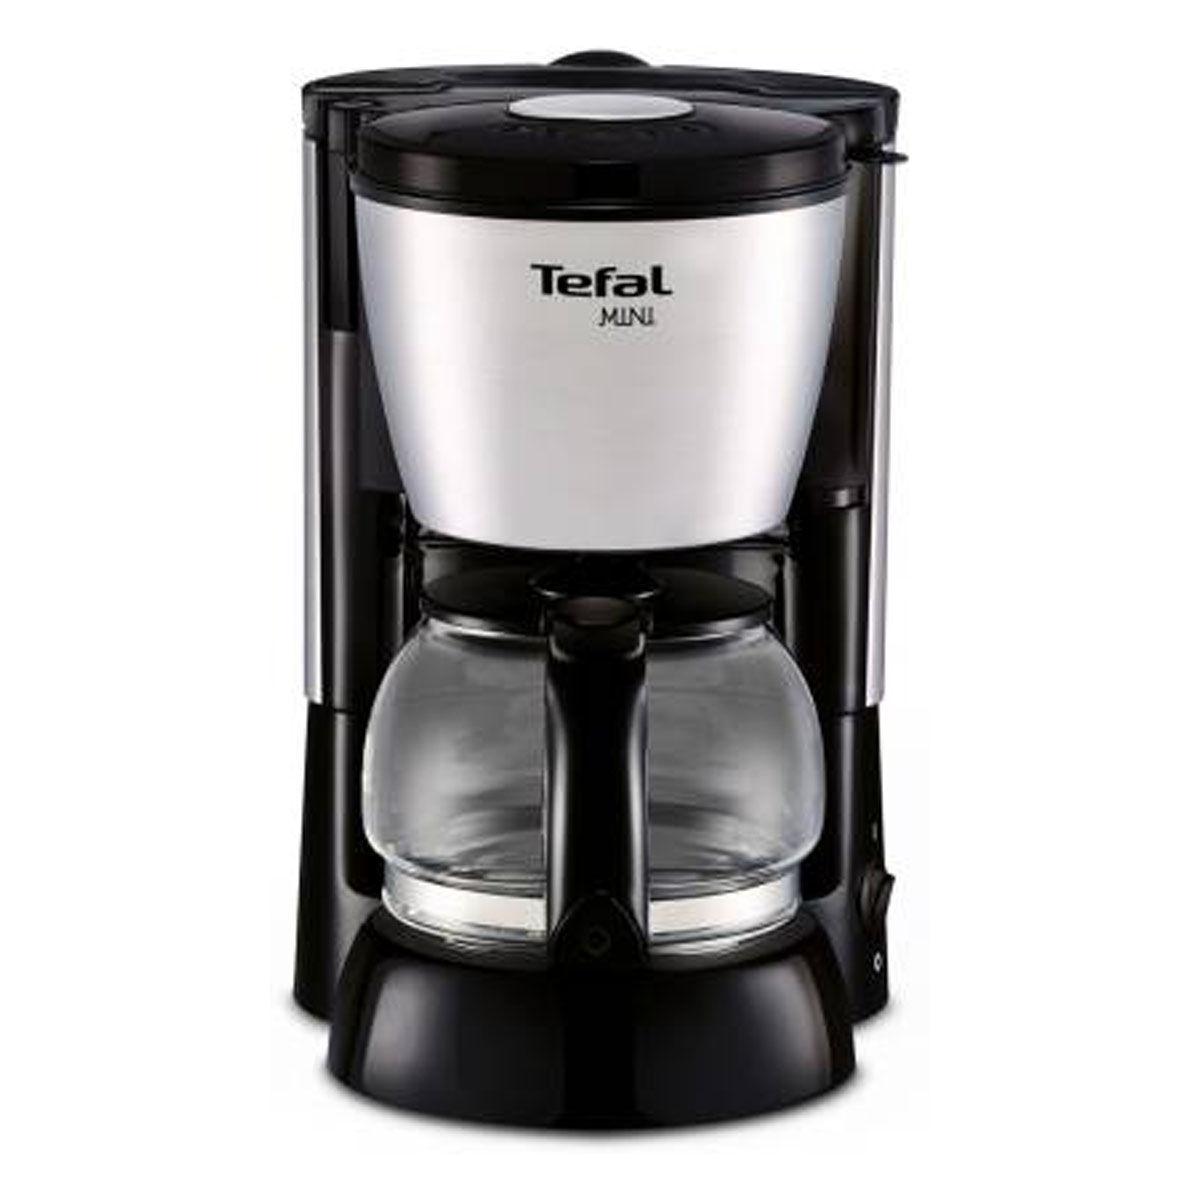 tefal 101 6 Cups Coffee Maker